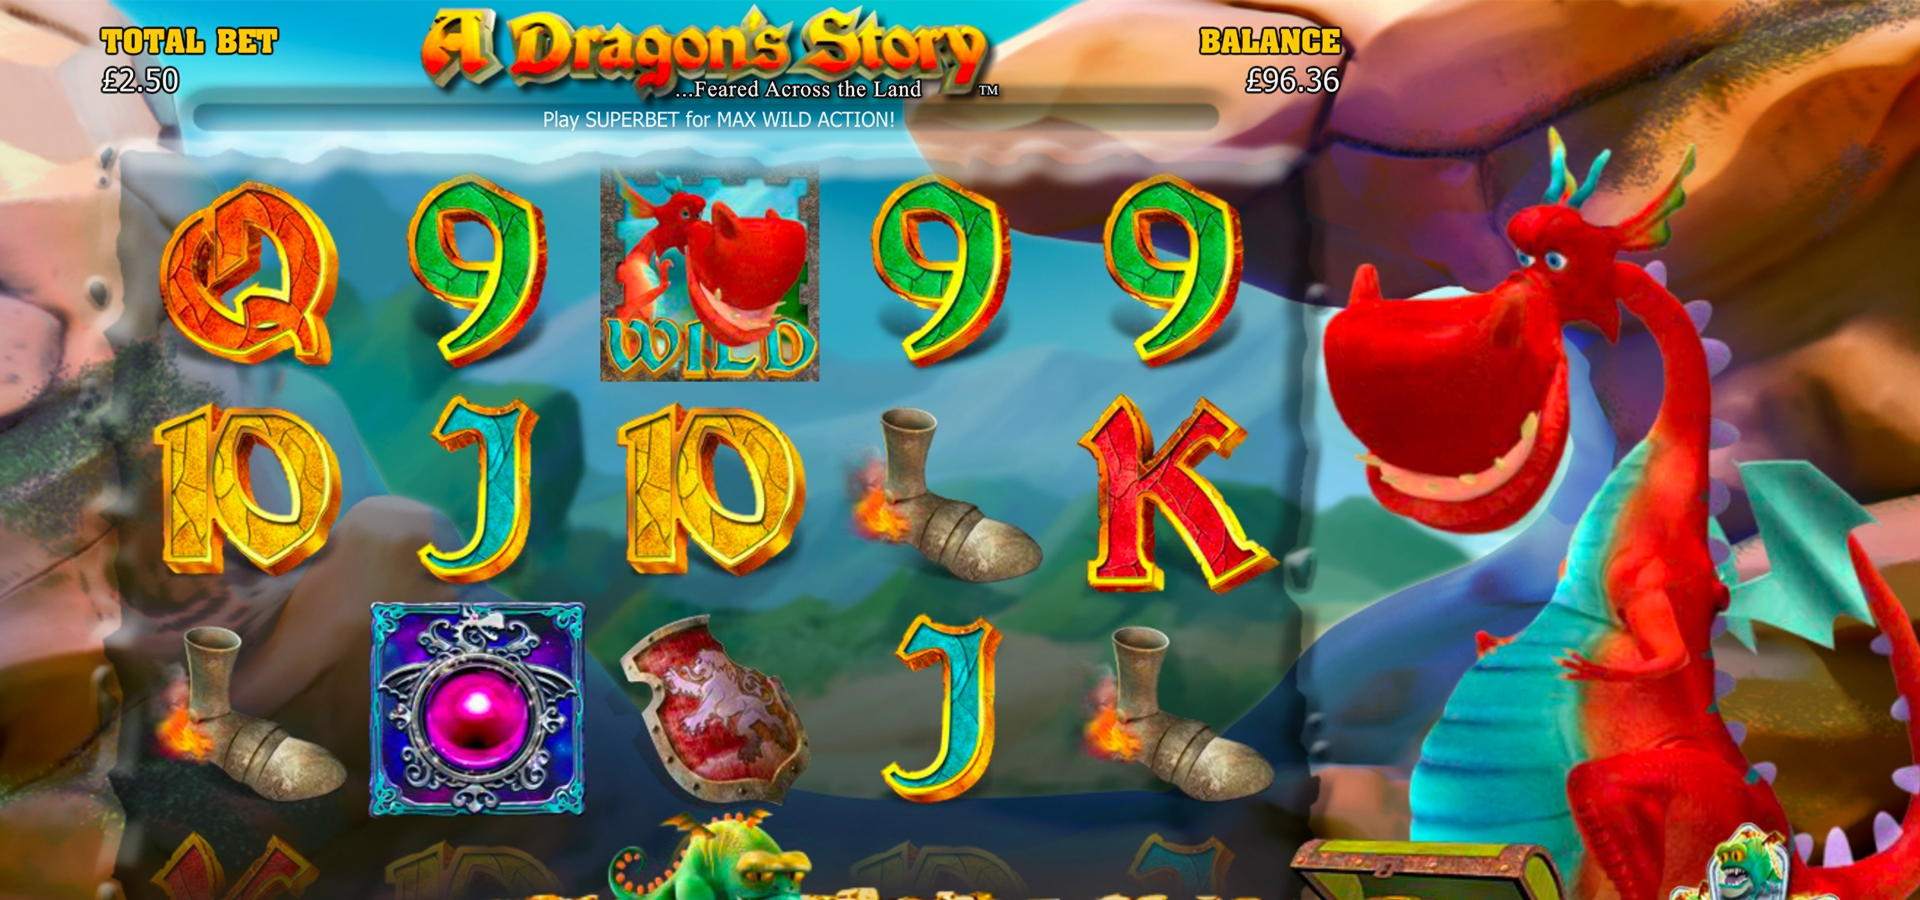 33 Free Spins Casino sur ABC Bingo